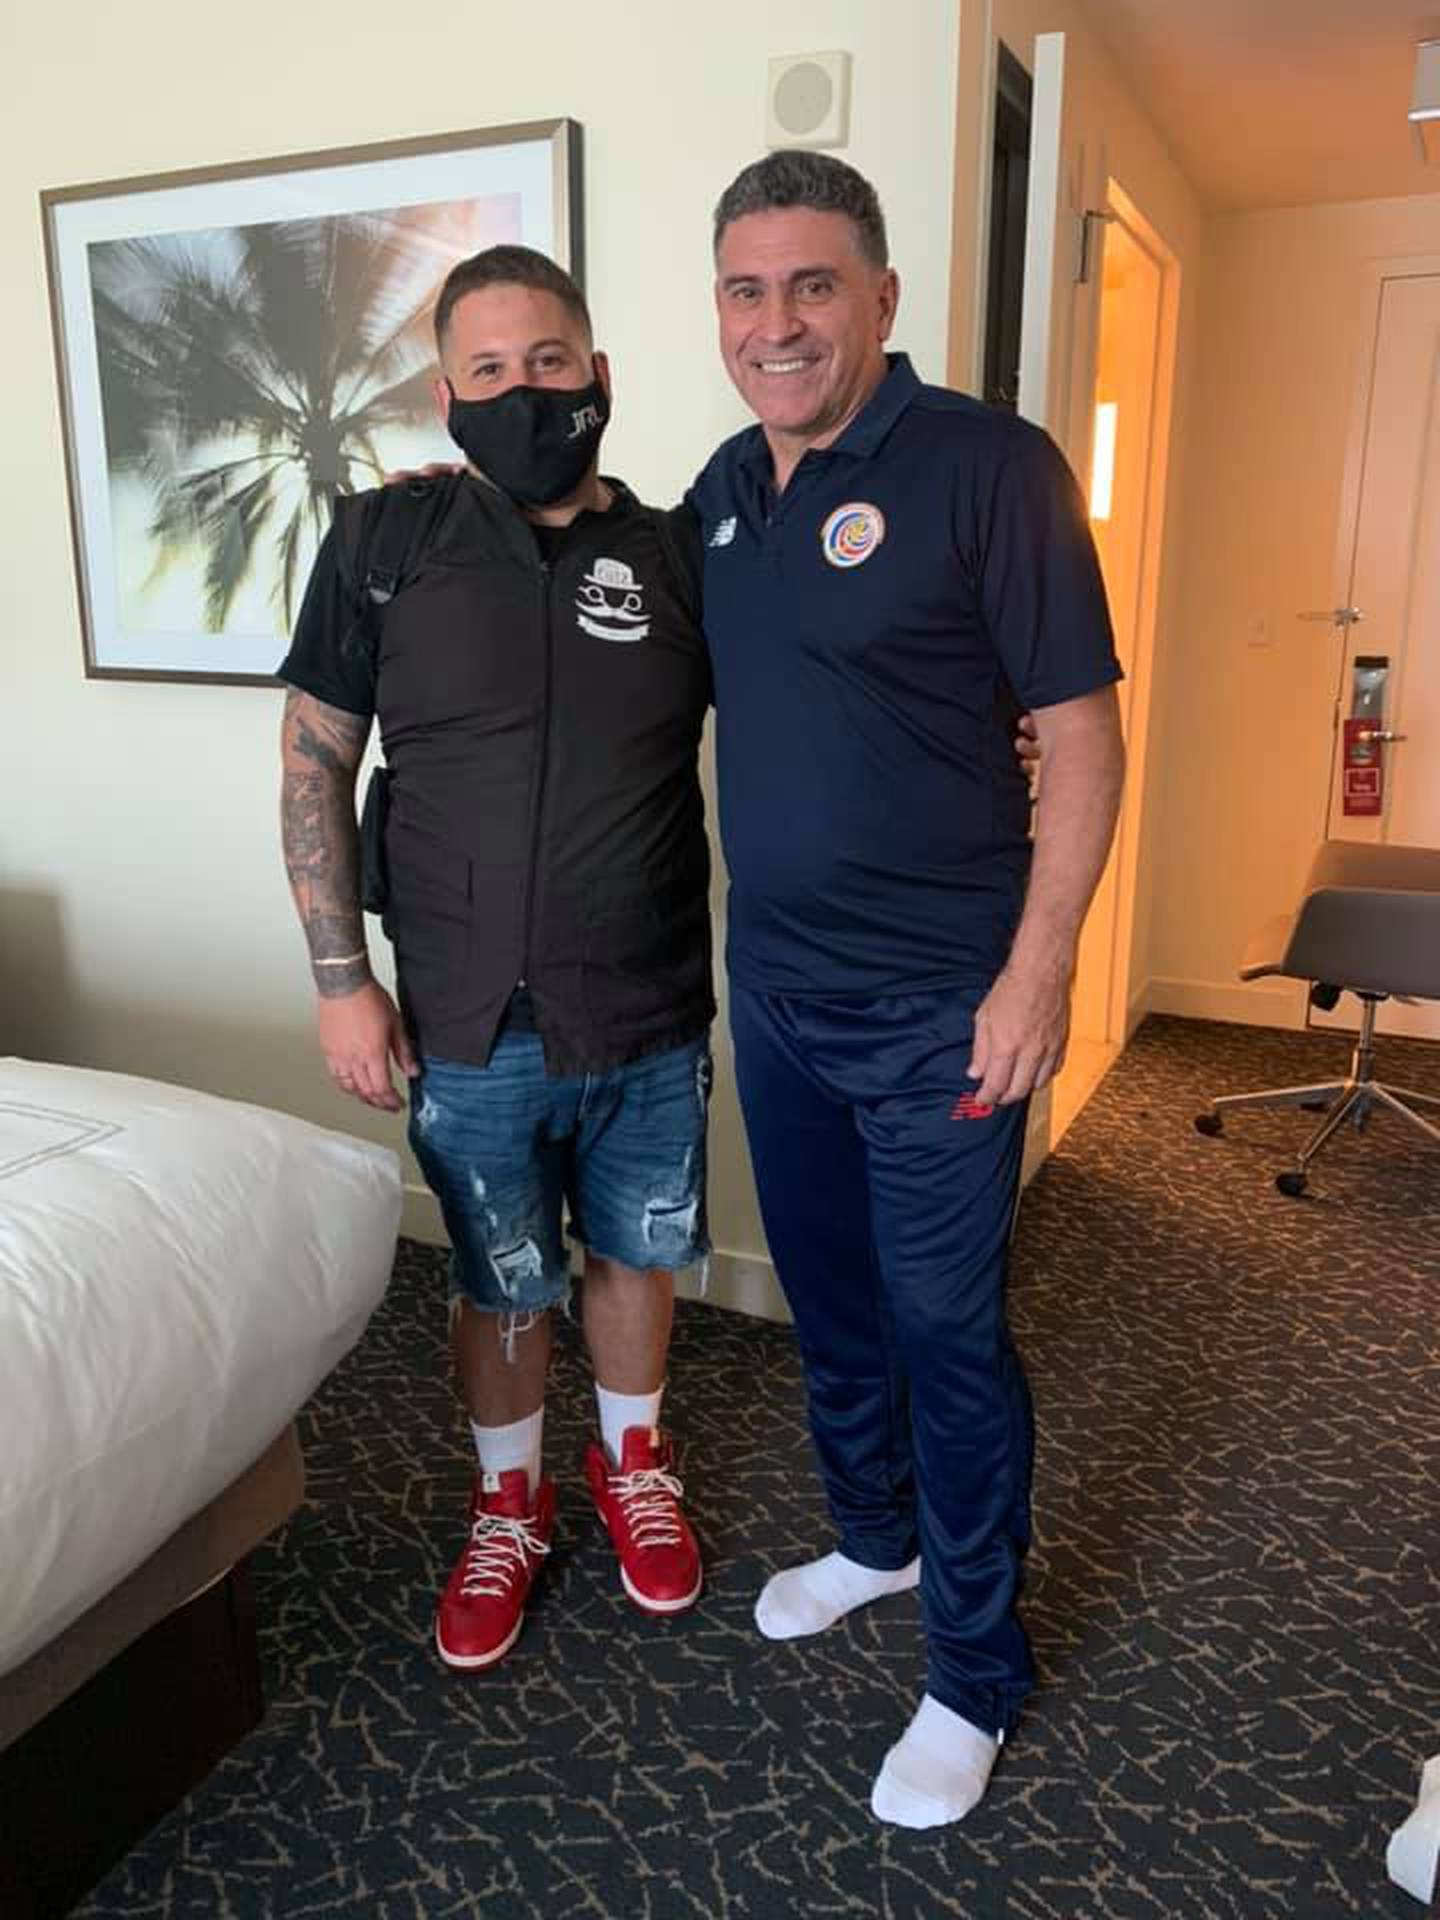 Alex Arrieta, peruano, barbero de la Sele en Orlando City